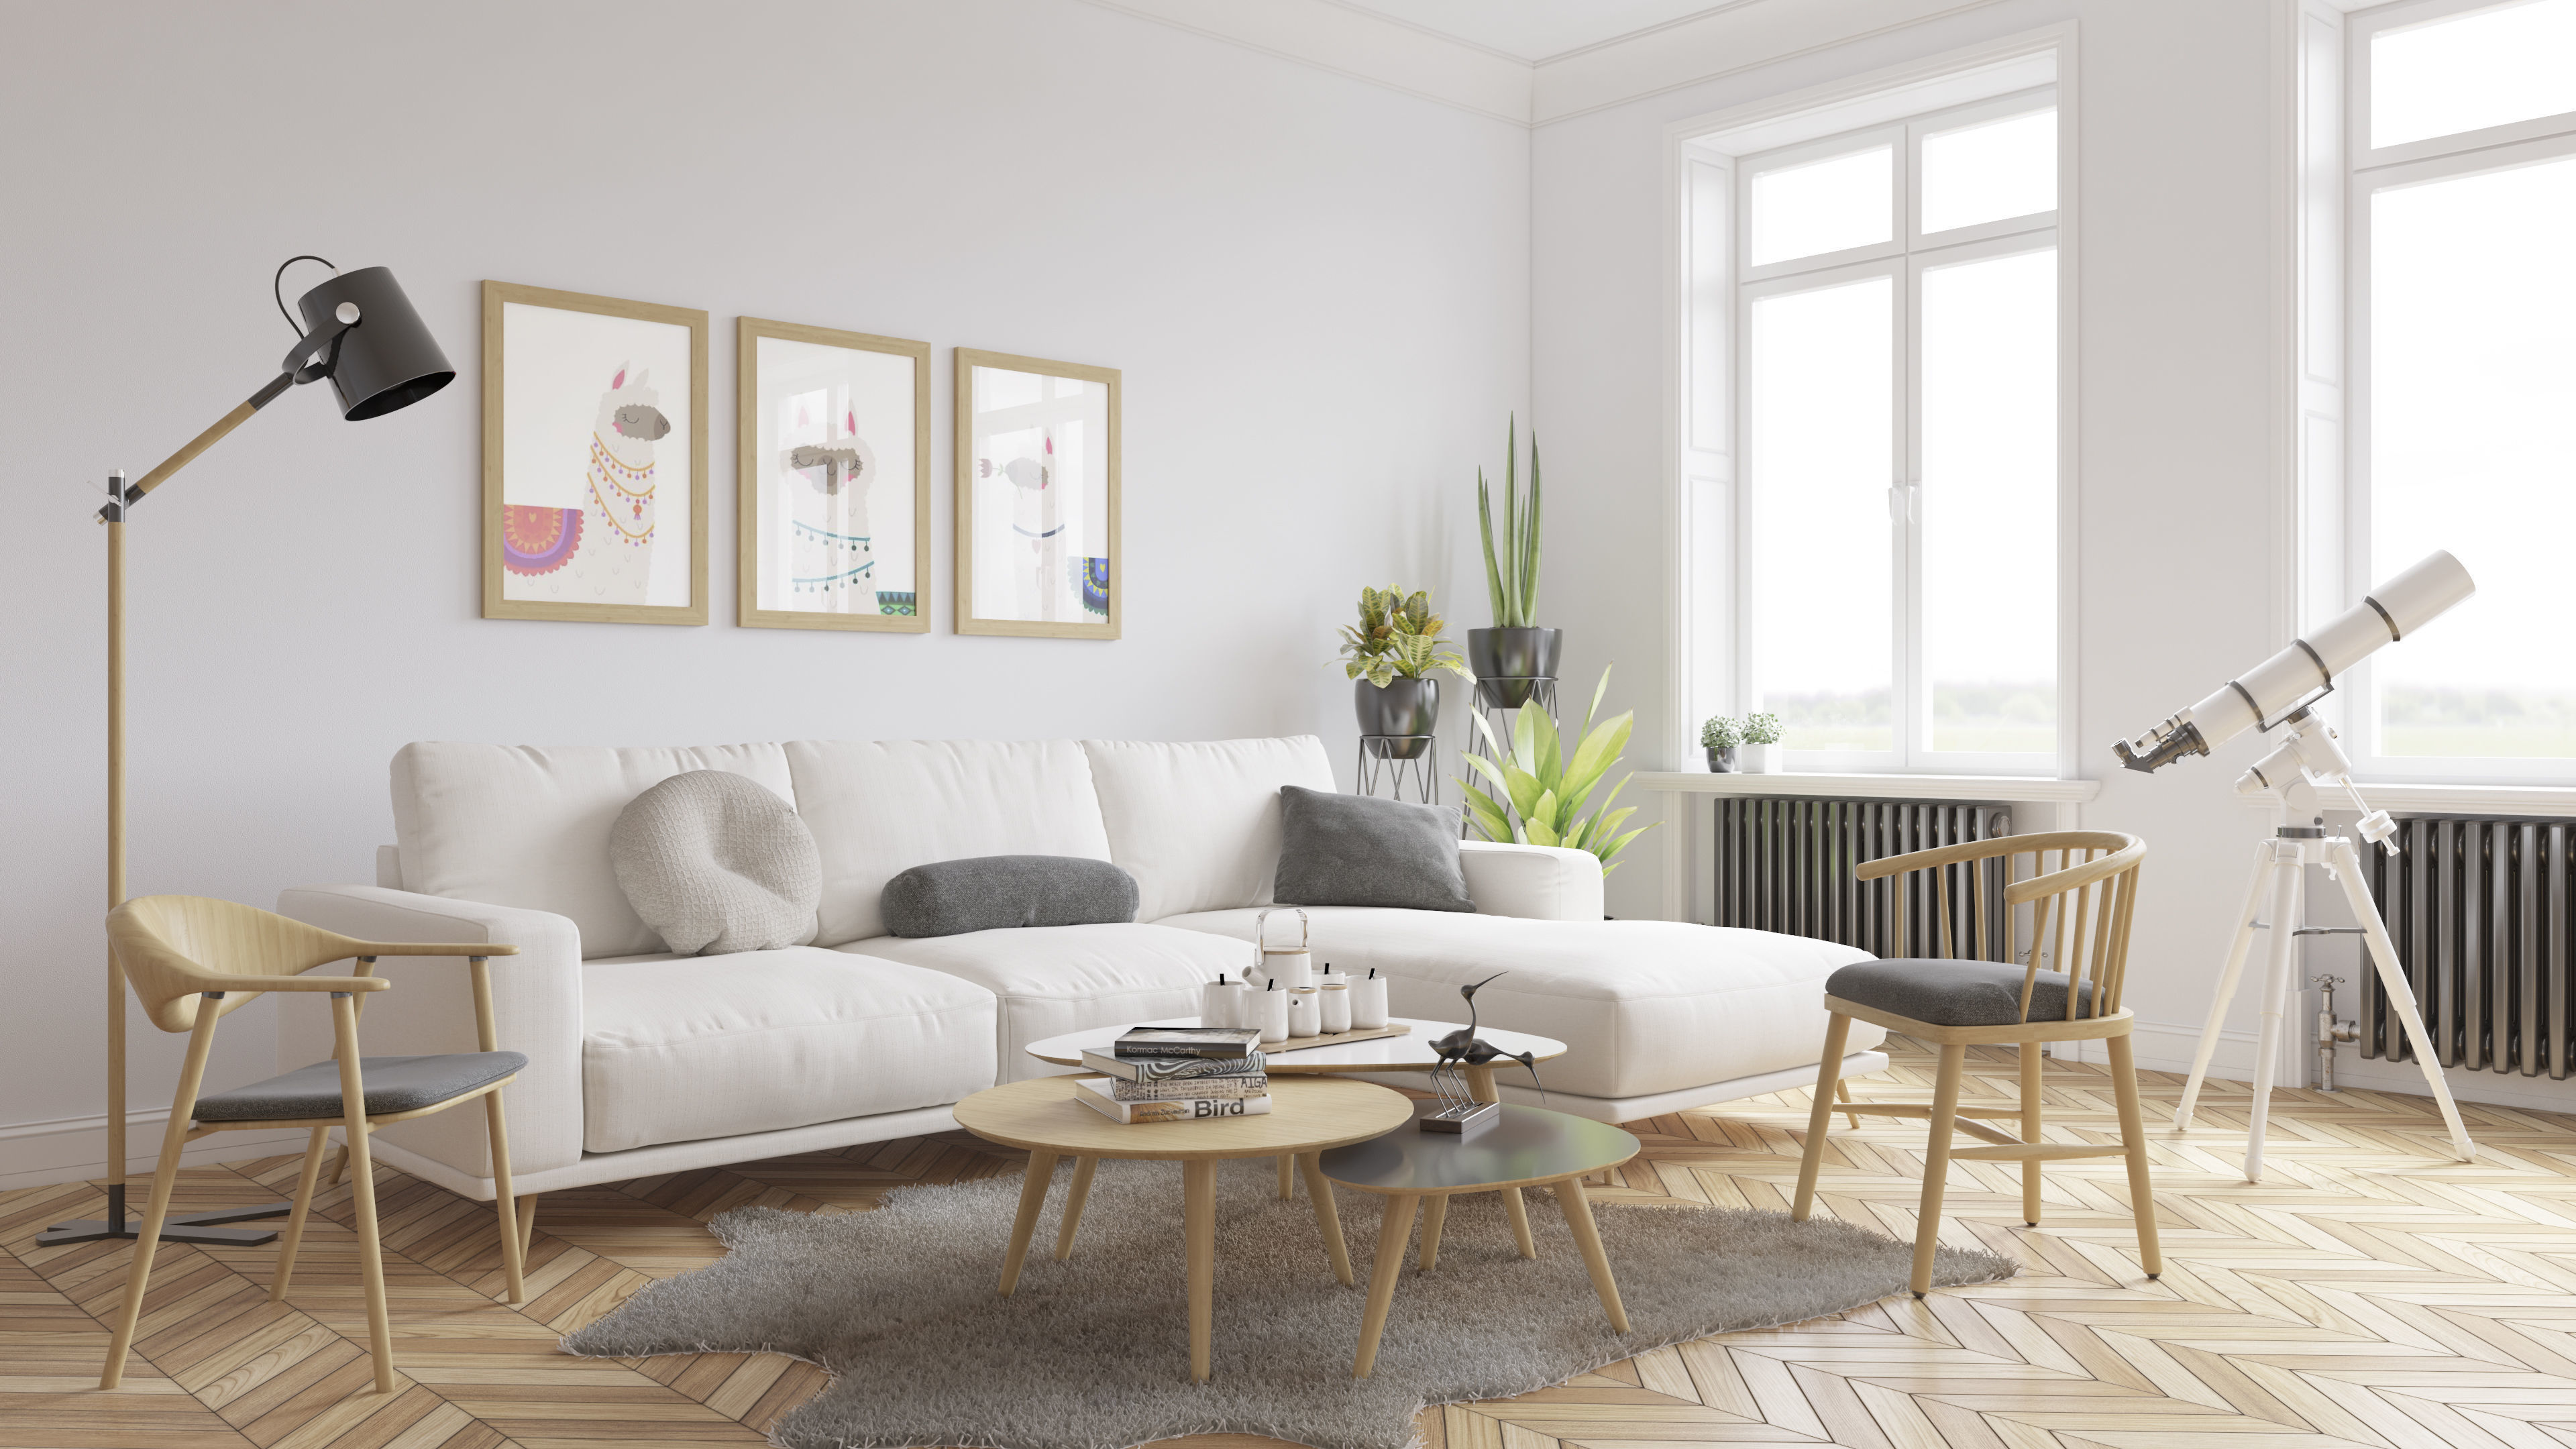 scandinavian living room 3d model vray settings and psd file 3d model low poly skp Top 10 Living Room Design